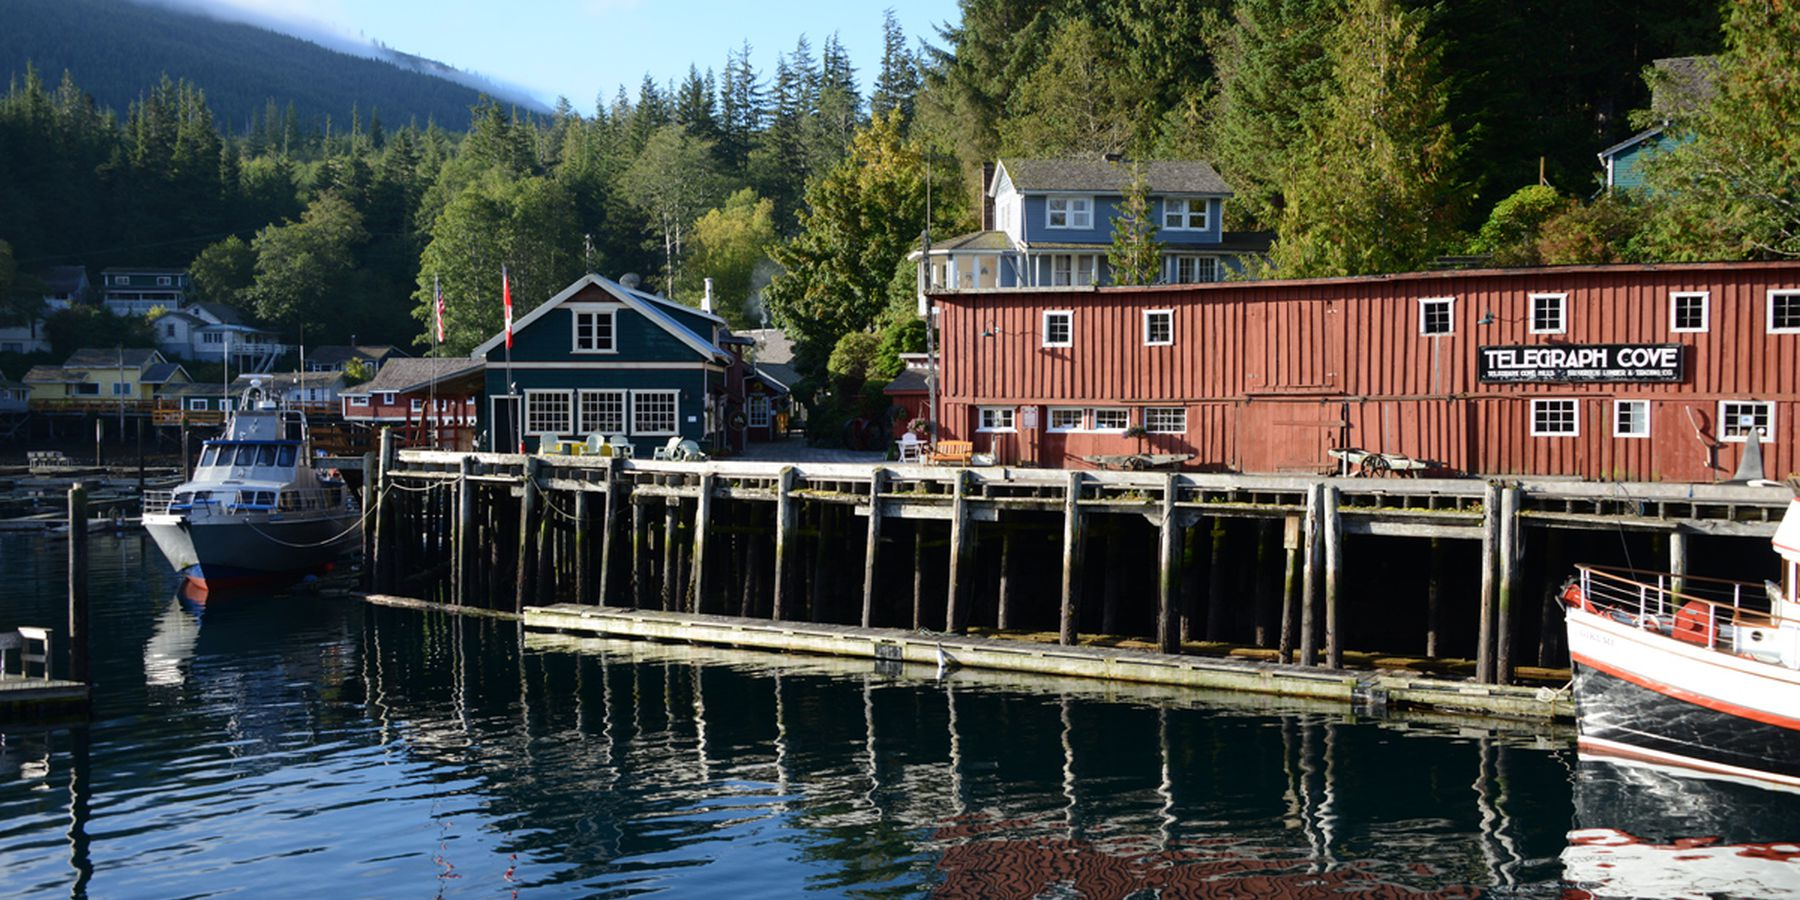 Telegraph Cove Resort - Vancouver Island - British Columbia - Canada - Doets Reizen